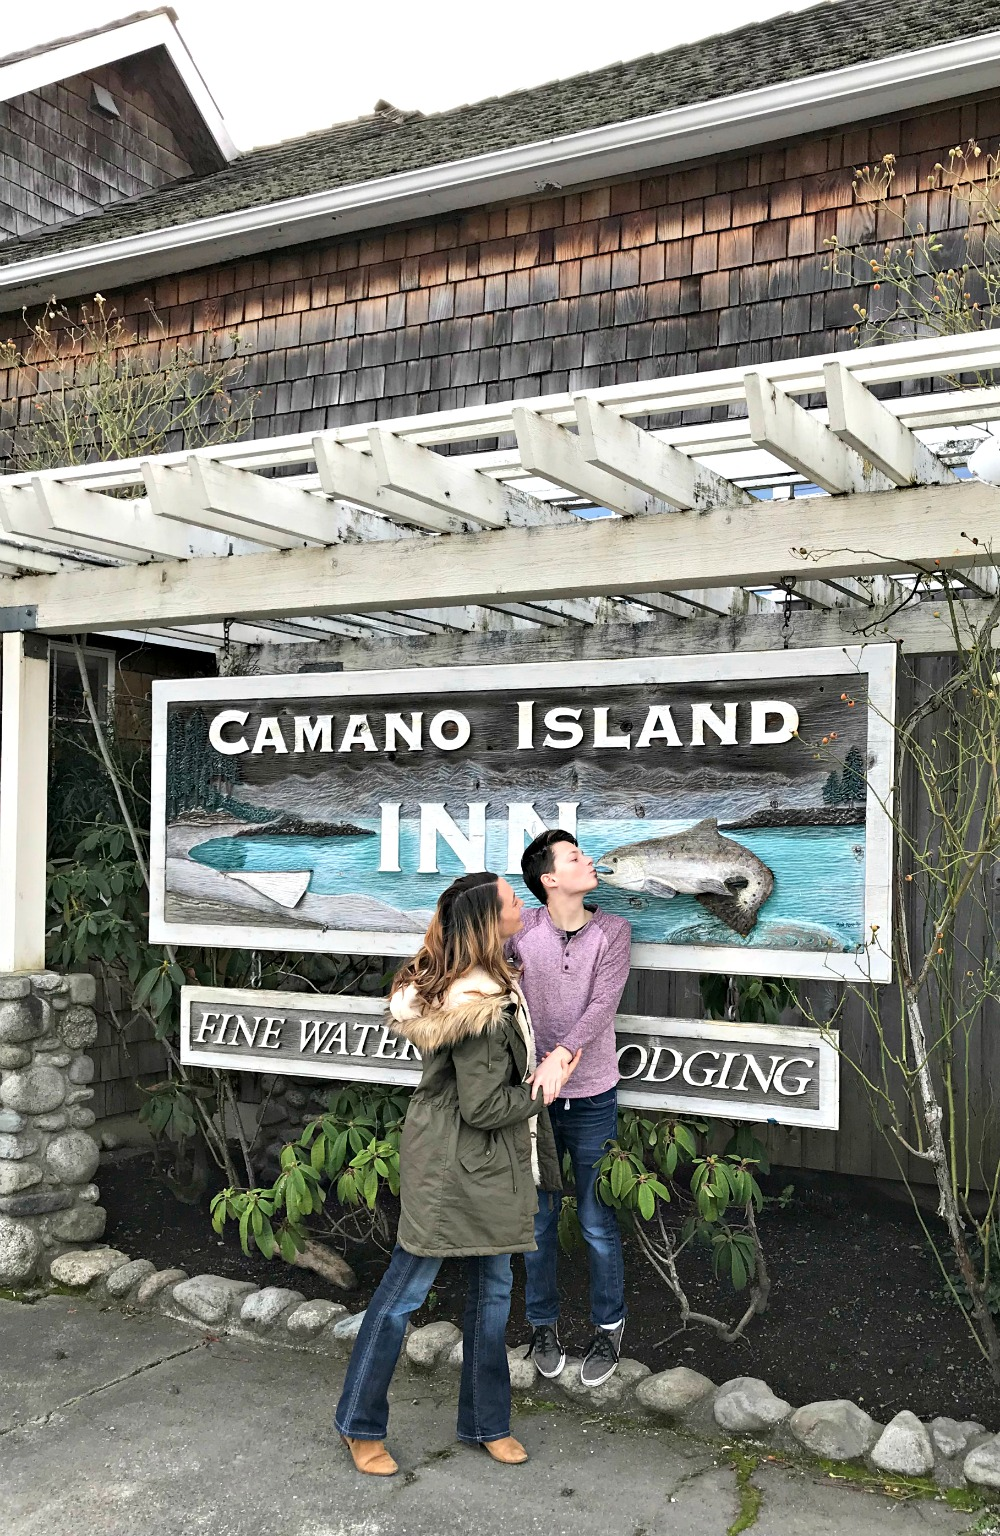 Camano Island Inn guest sign